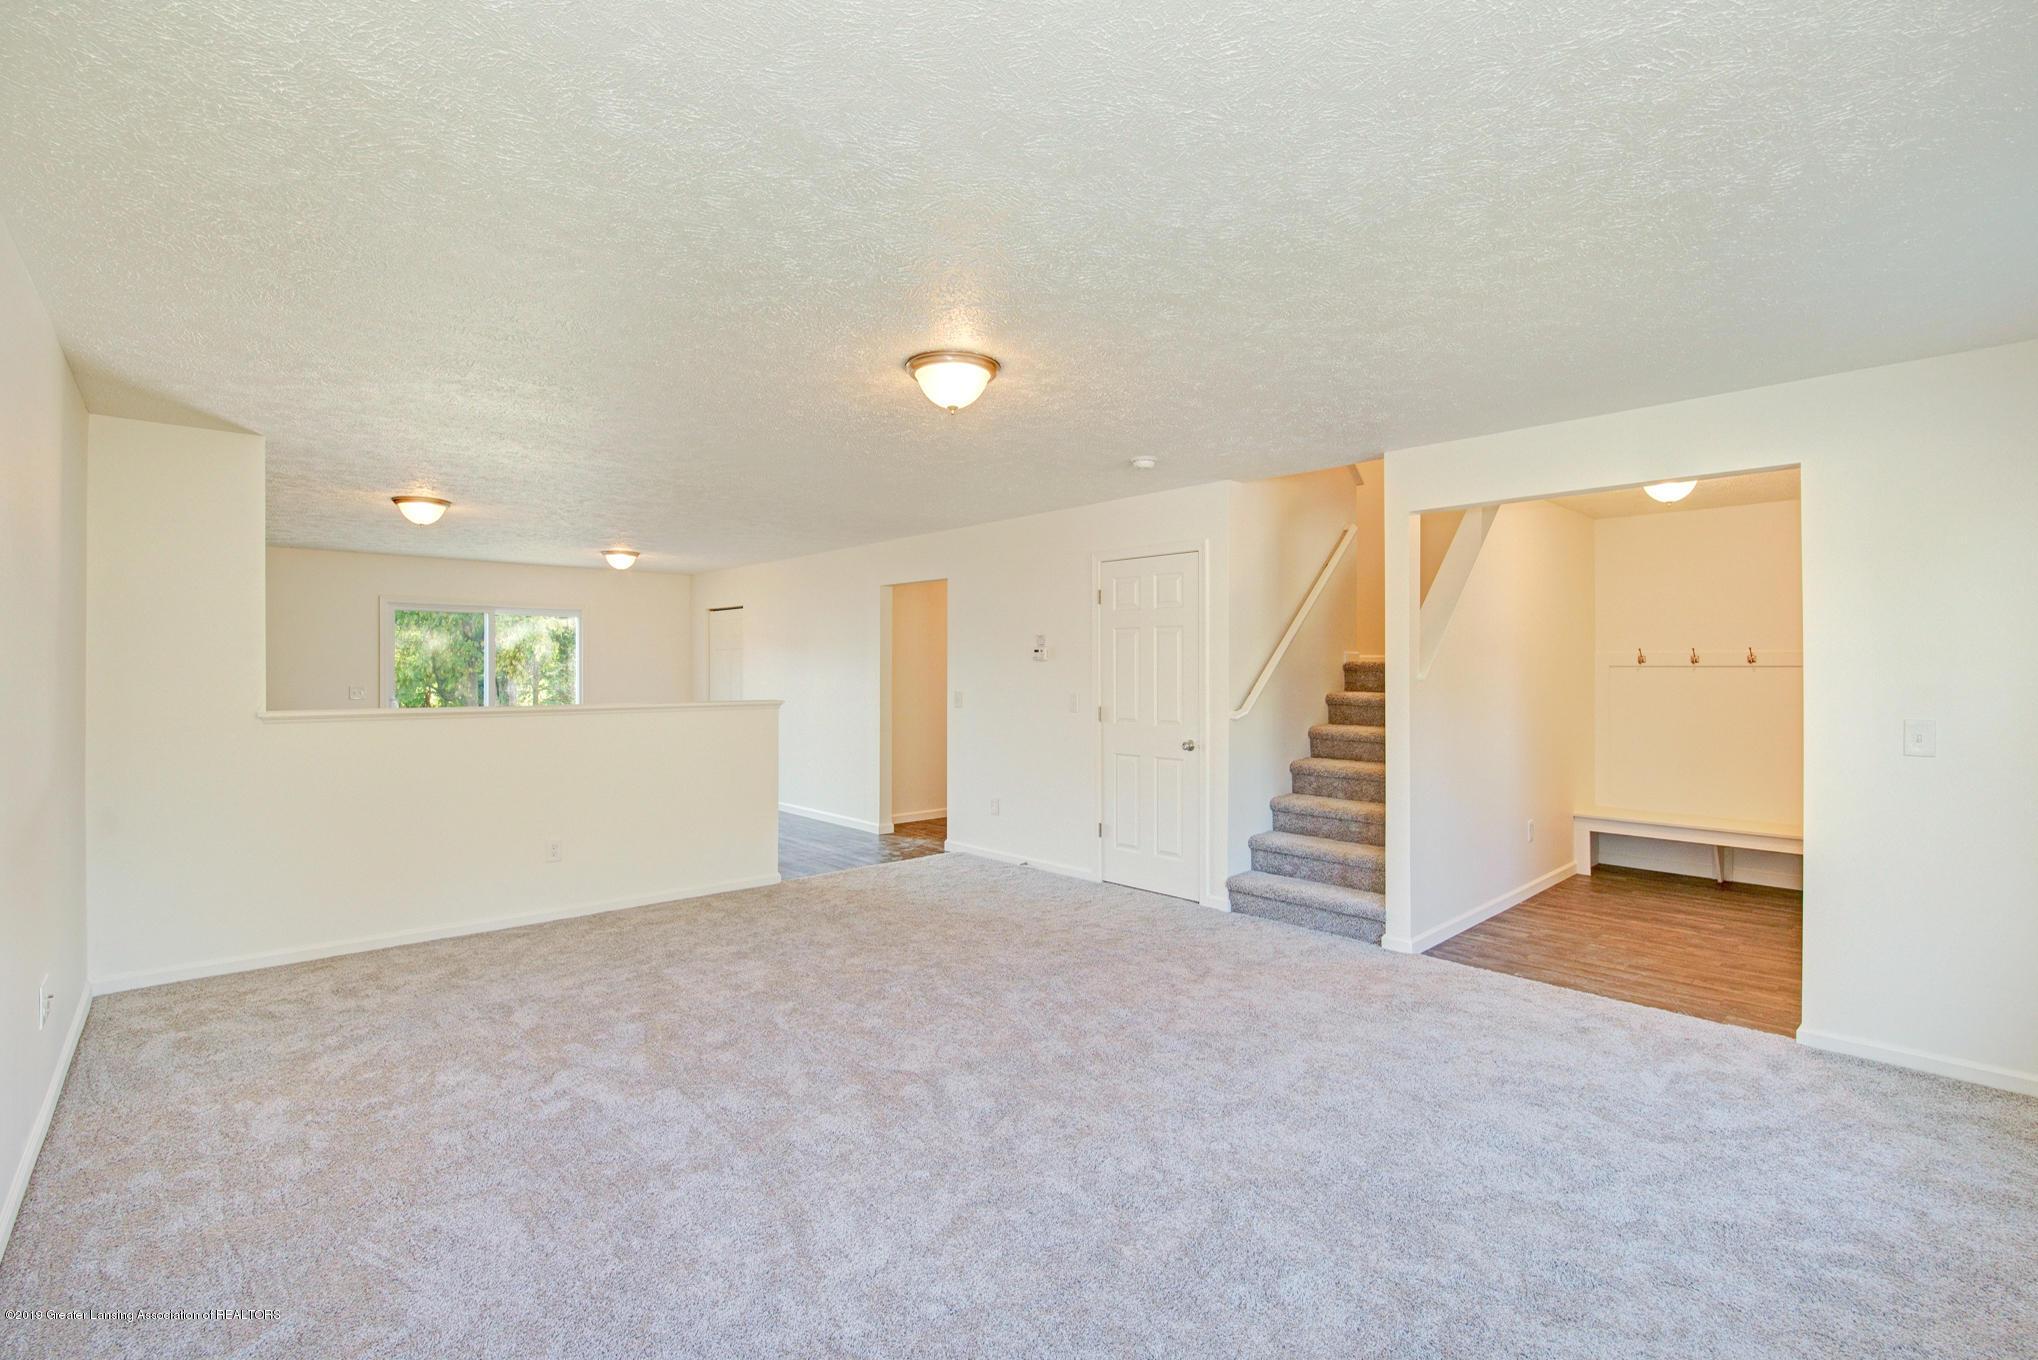 1125 River Oaks Dr - OAK082-i1830-Great Room1 - 3